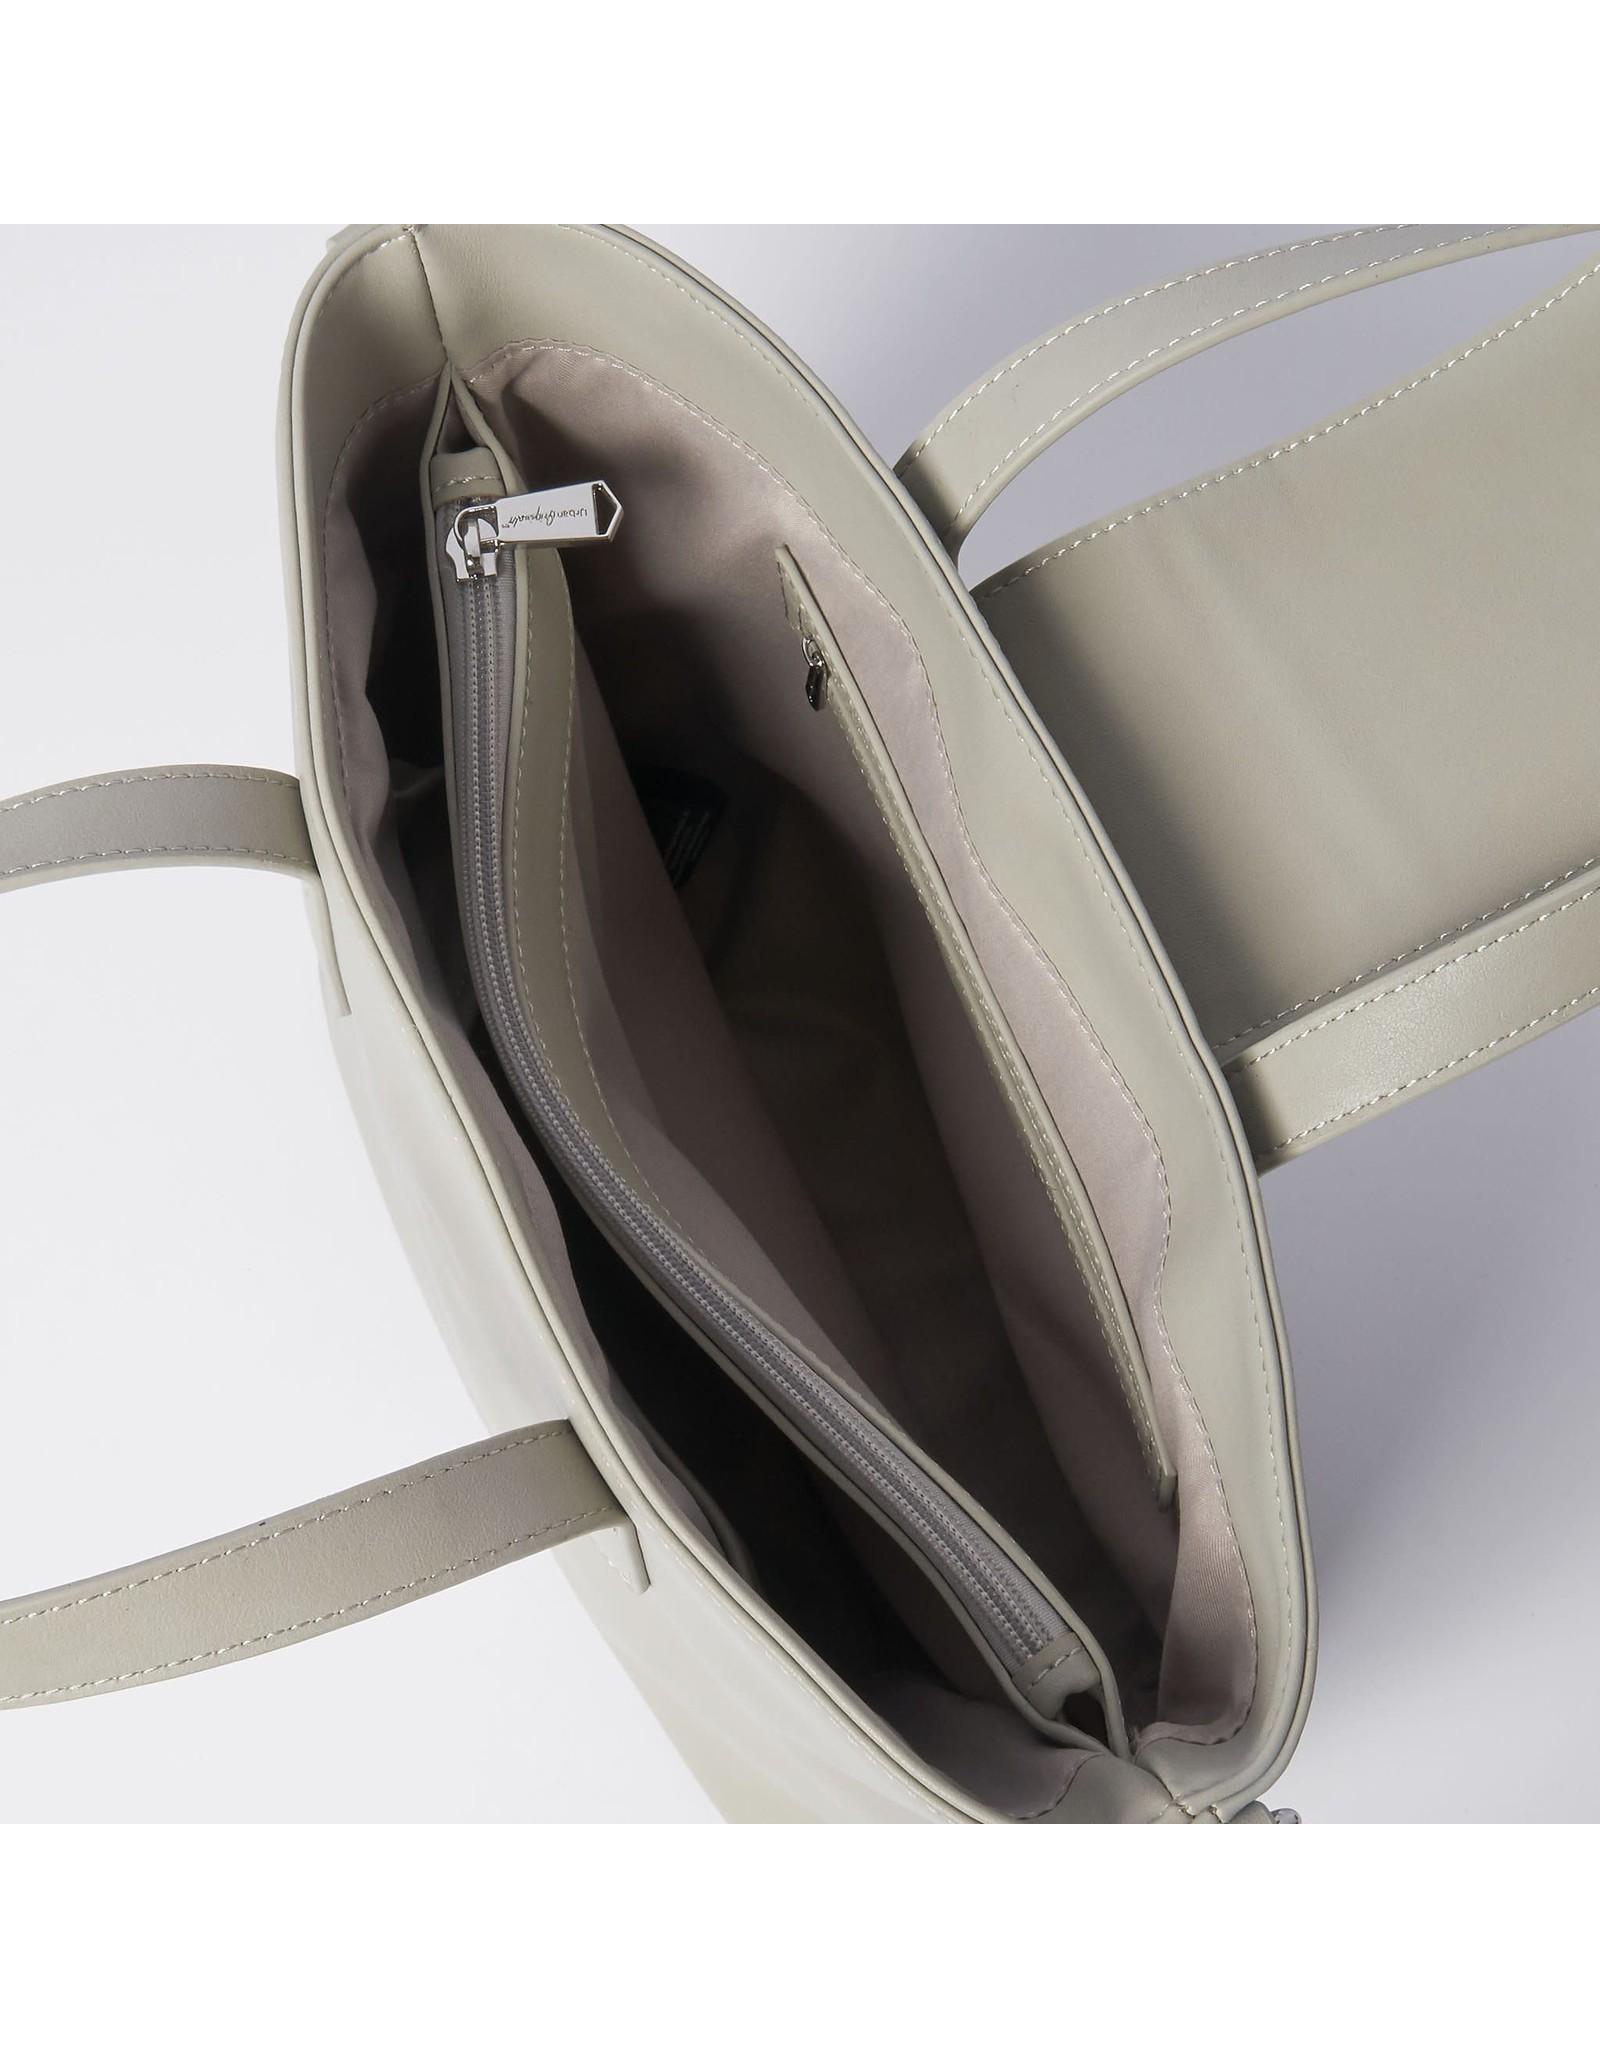 Urban Originals Together Handbag Grey